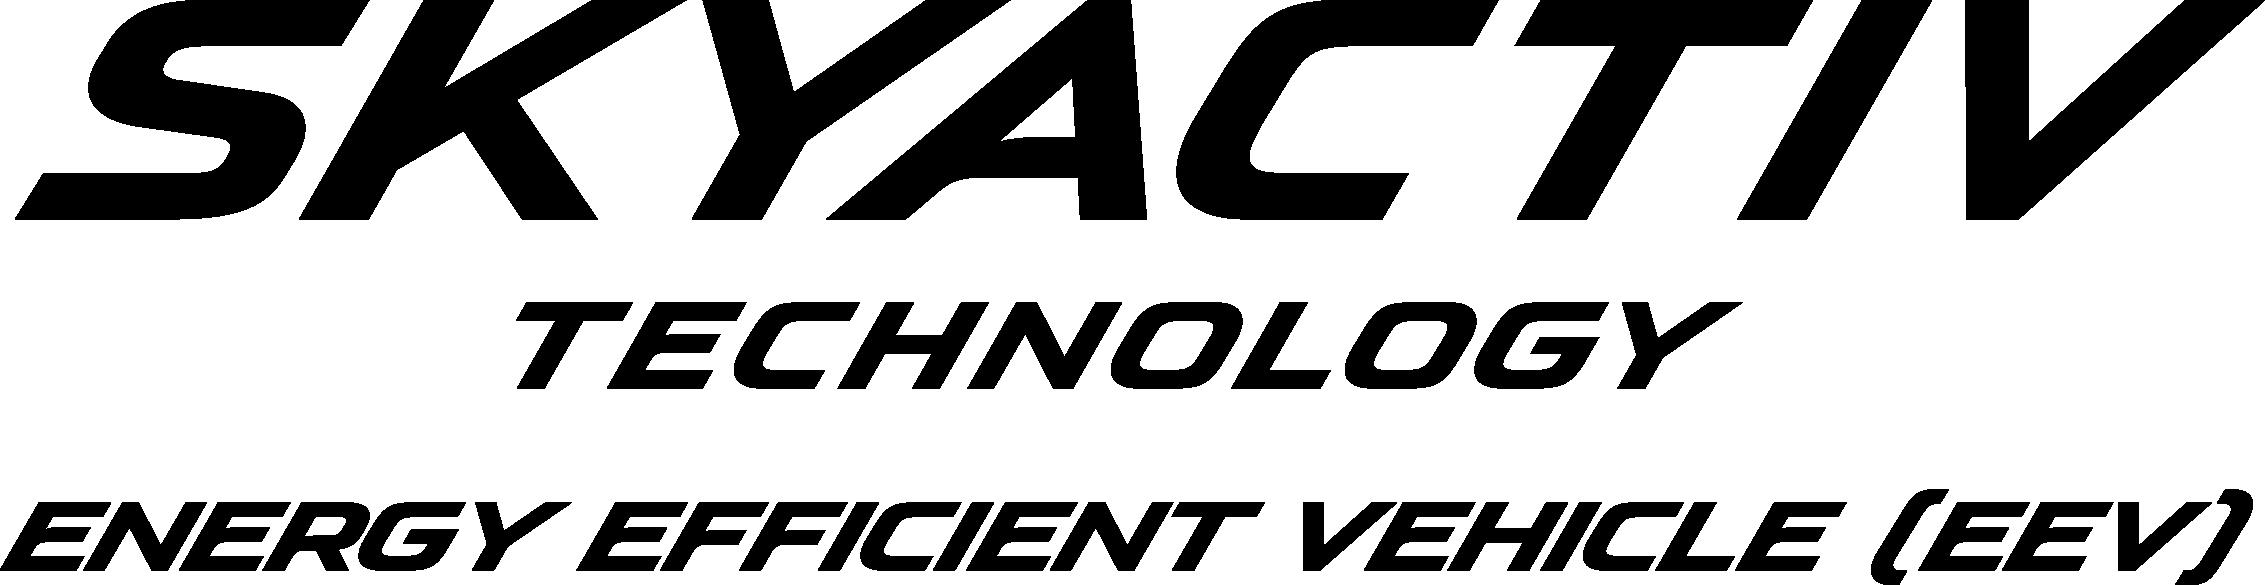 Mazda Skyactiv Logo PNG-PlusPNG.com-2265 - Mazda Skyactiv Logo PNG